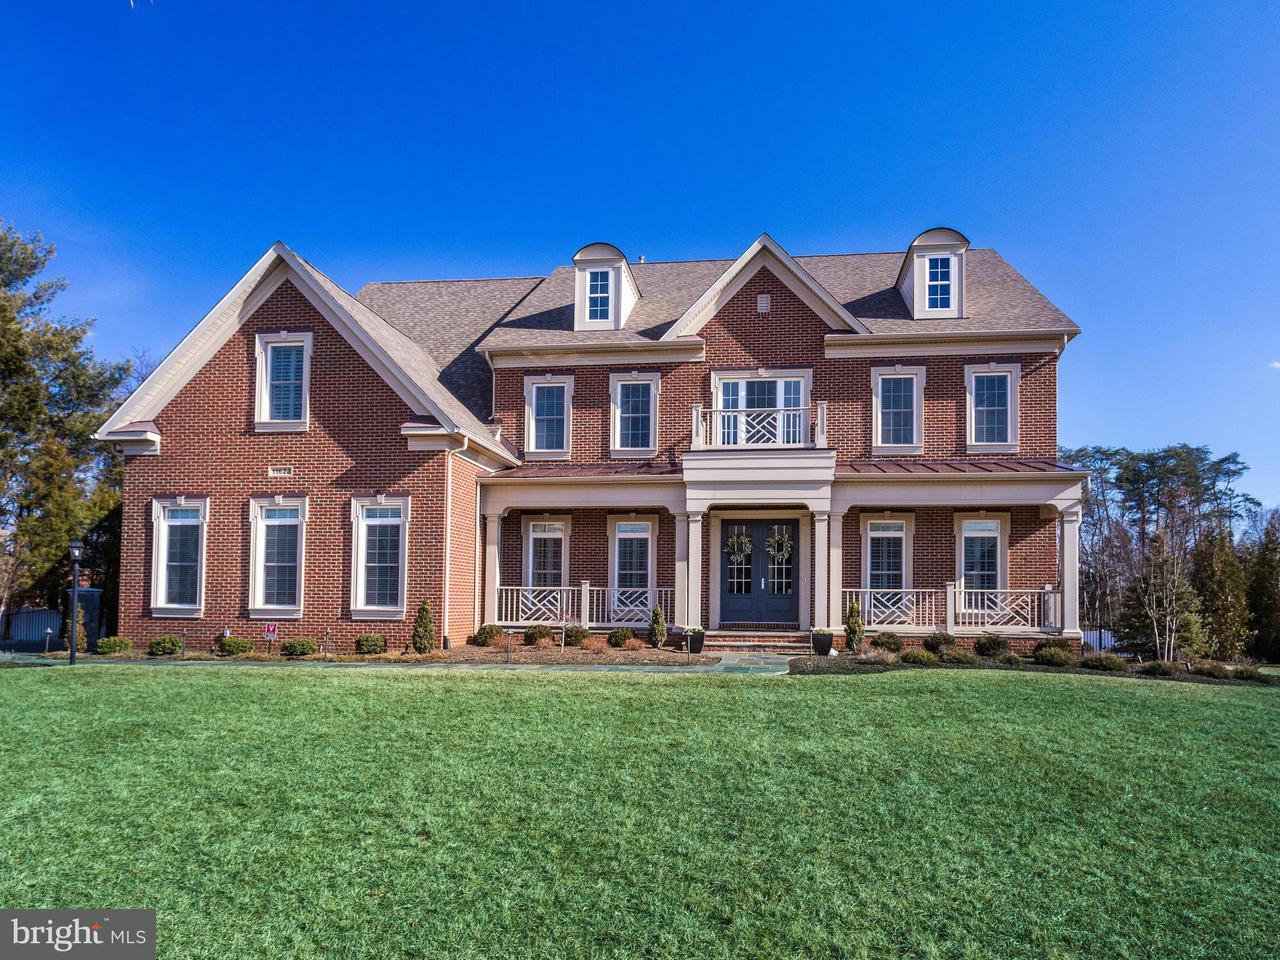 Single Family Home for Sale at 11623 Verna Drive 11623 Verna Drive Oakton, Virginia 22124 United States